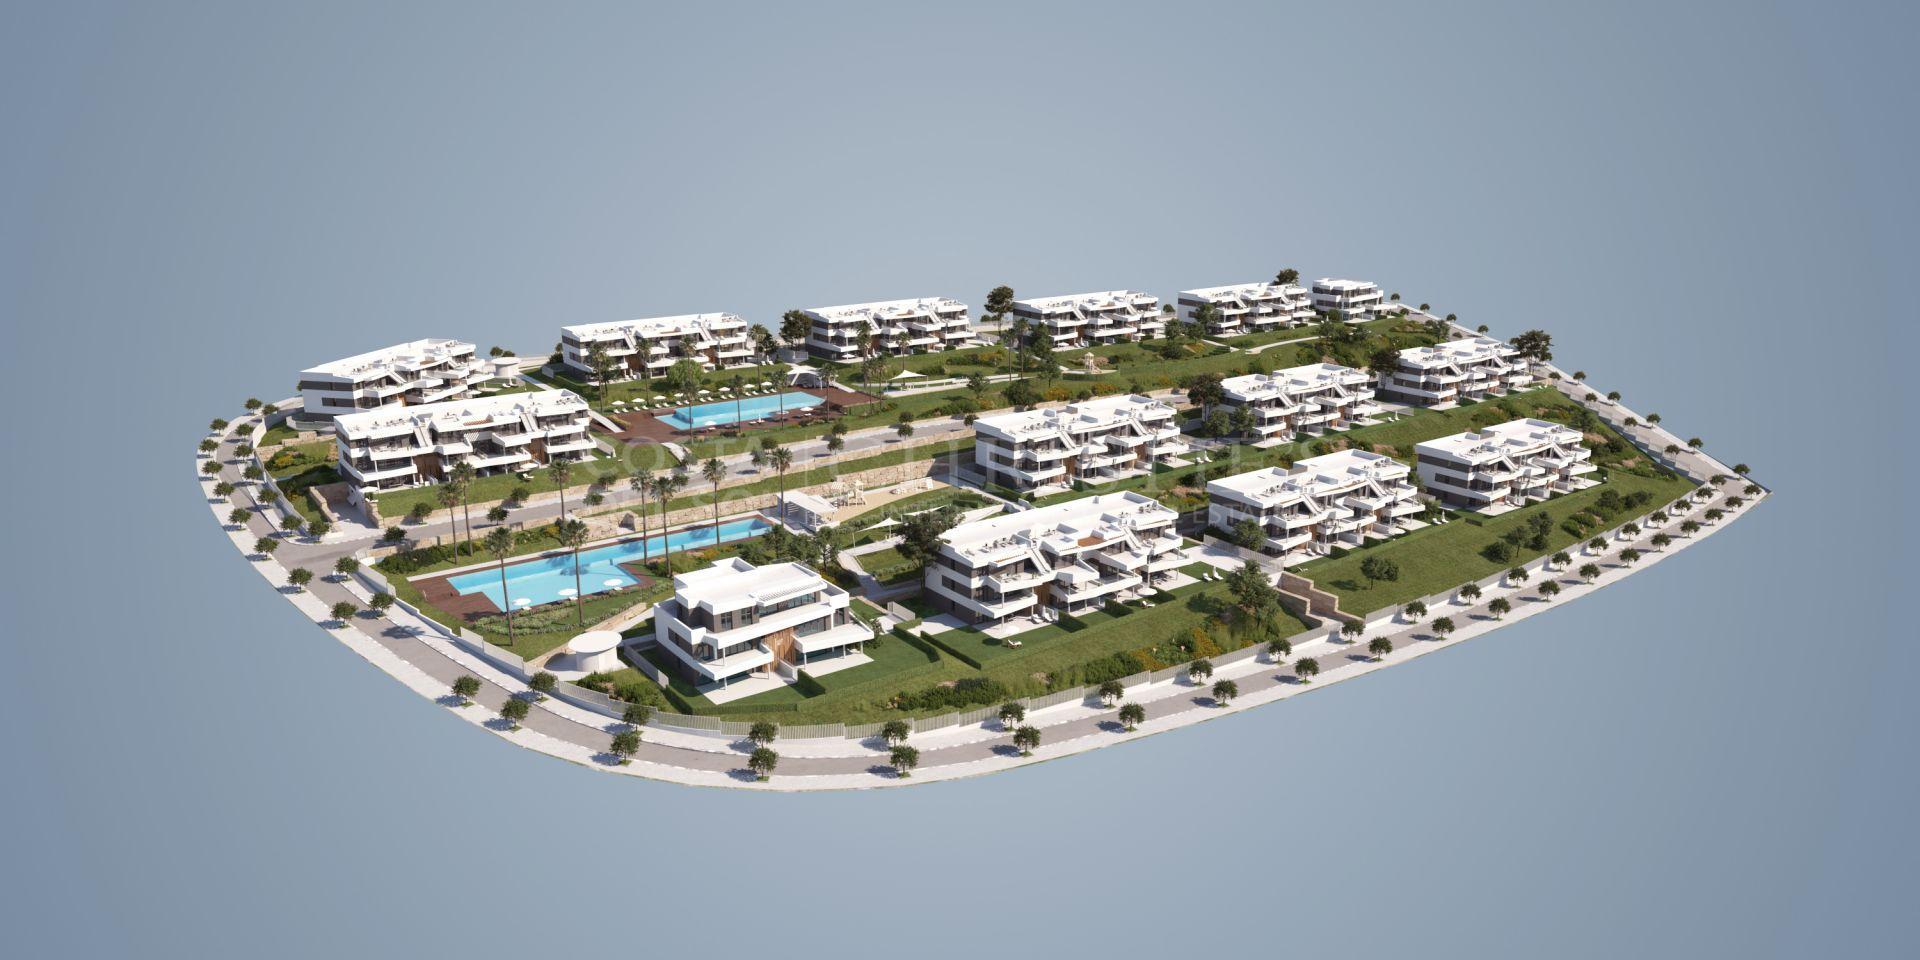 LIMONAR HOMES, El Limonar, Malaga - Este - Limonar Homes | Christie's International Real Estate